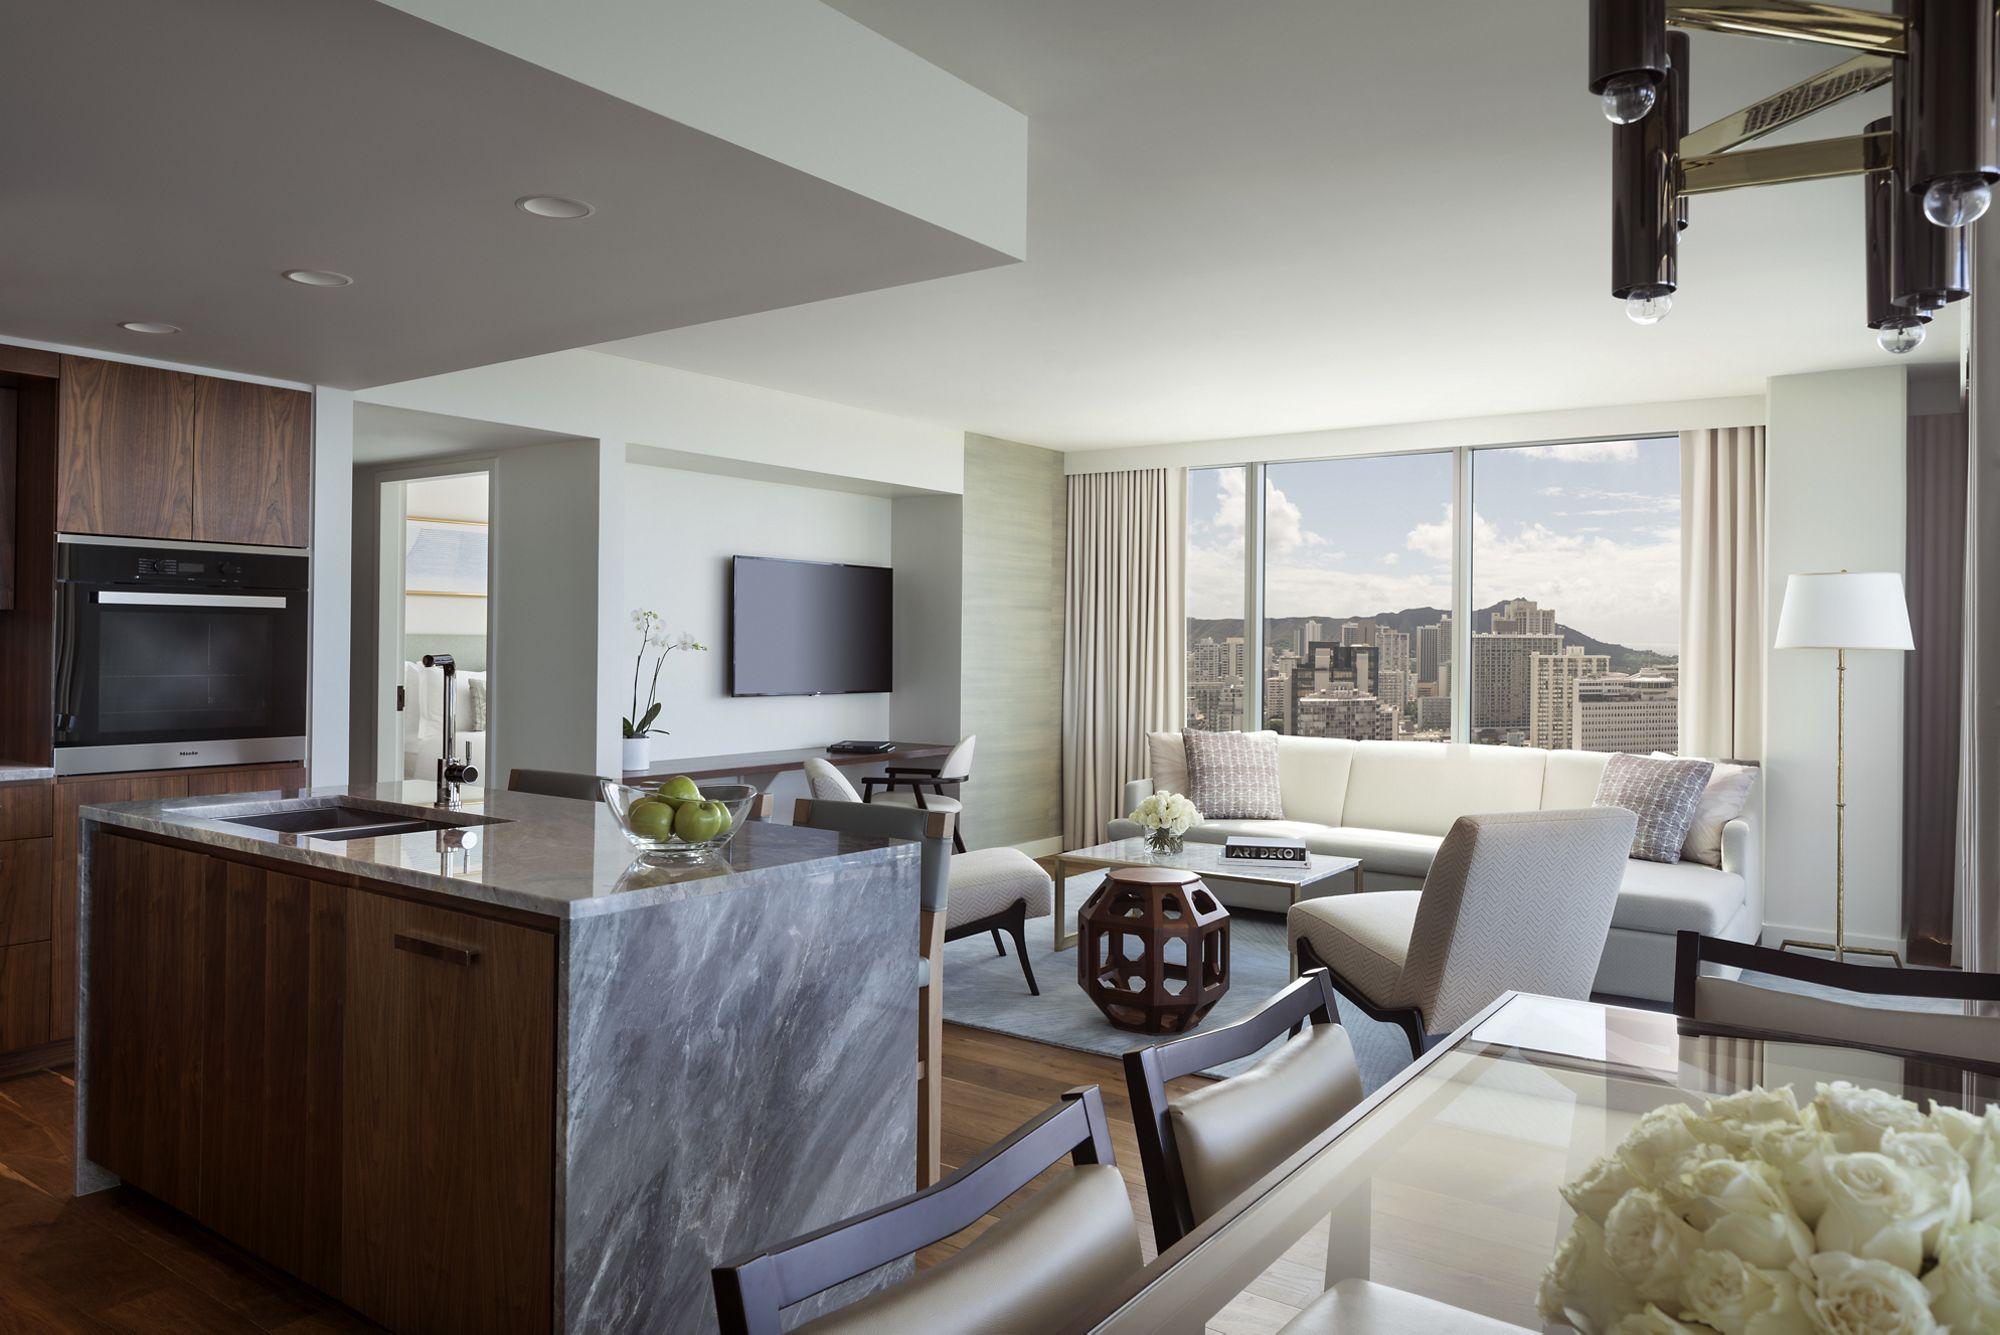 Grand Ocean View 3 Bedroom Suite The Ritz Carlton Waikiki Beach